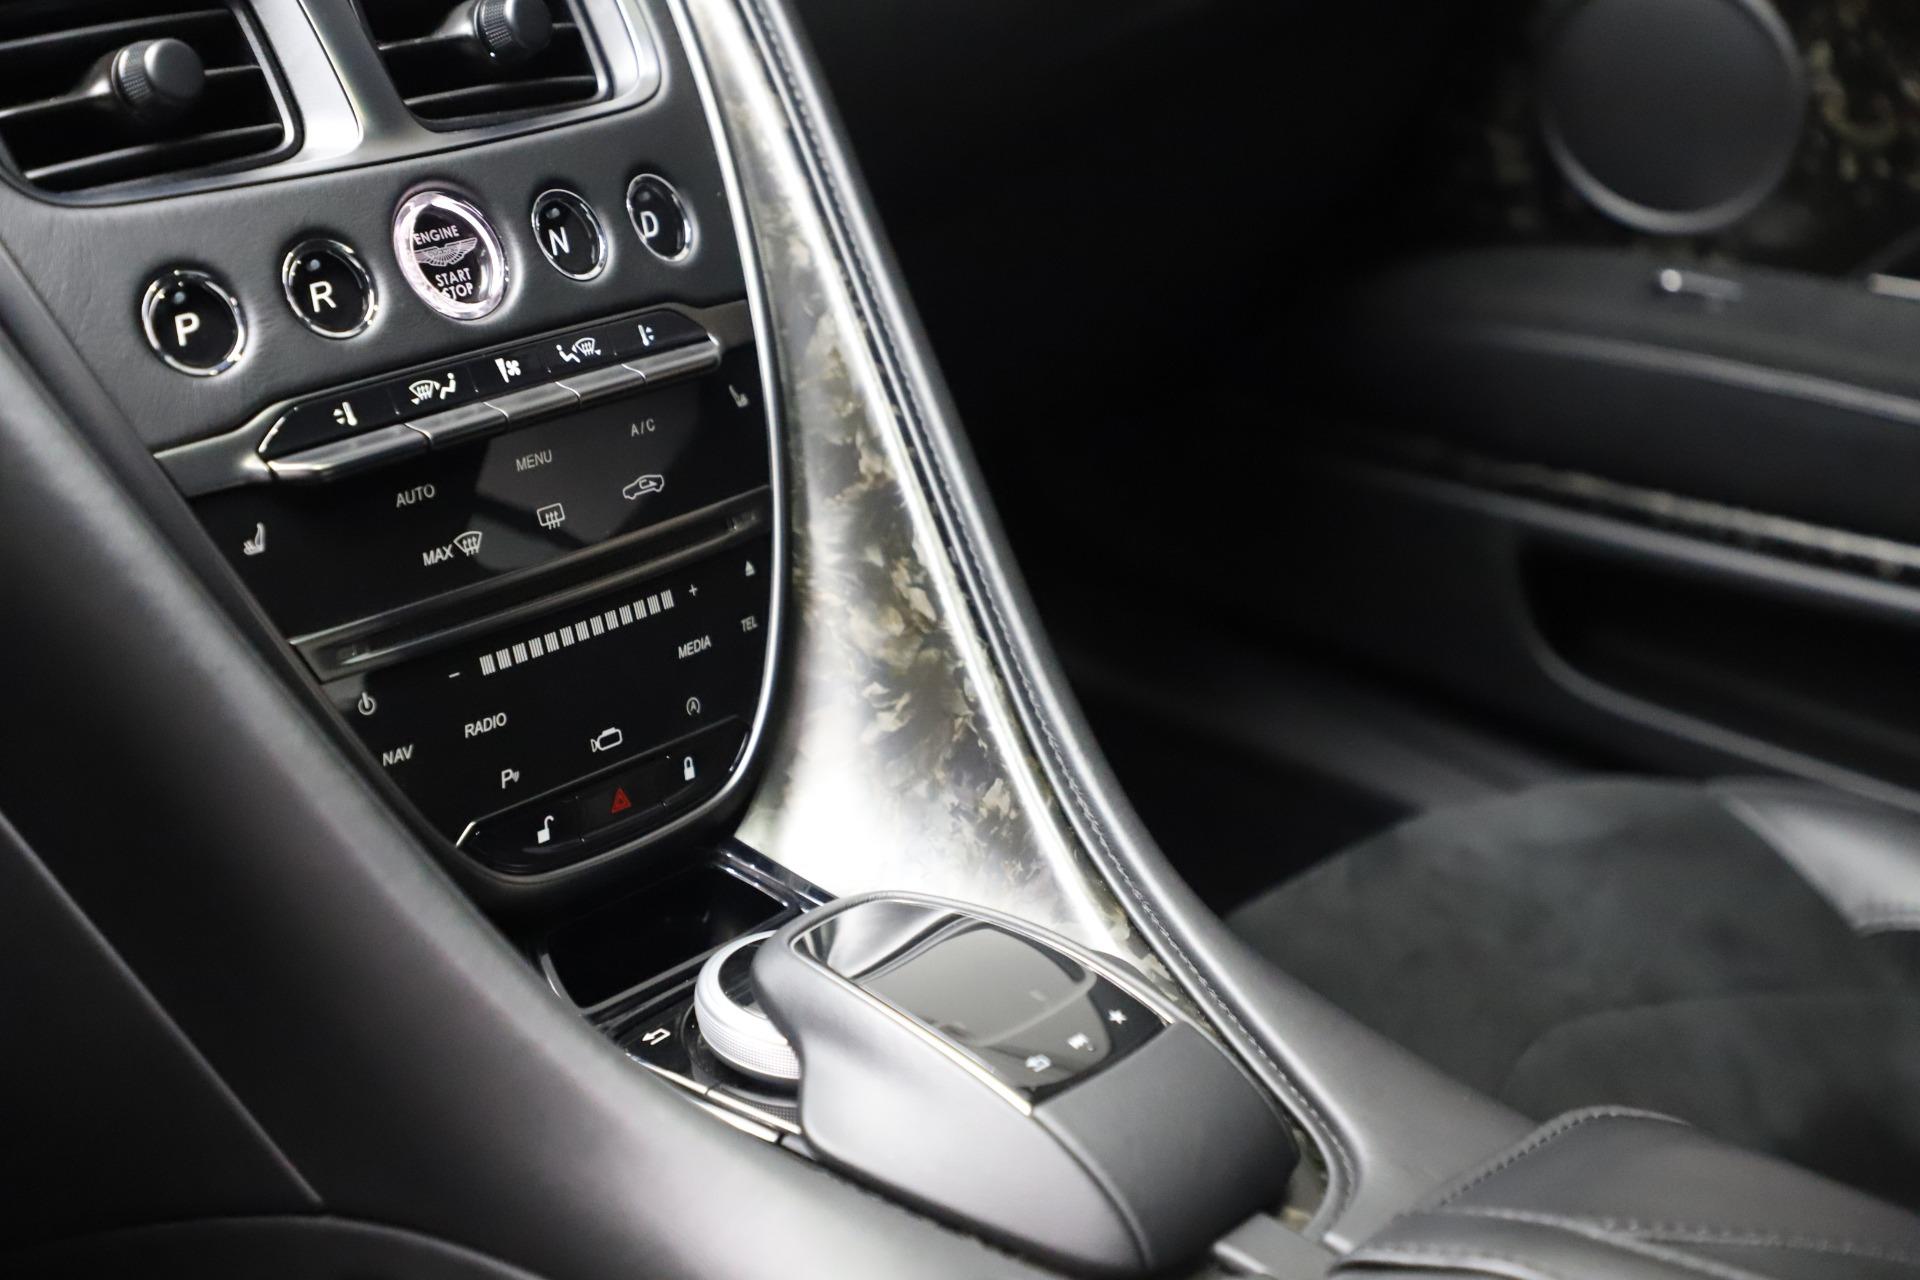 Used 2019 Aston Martin DBS Superleggera Coupe For Sale In Westport, CT 3570_p21